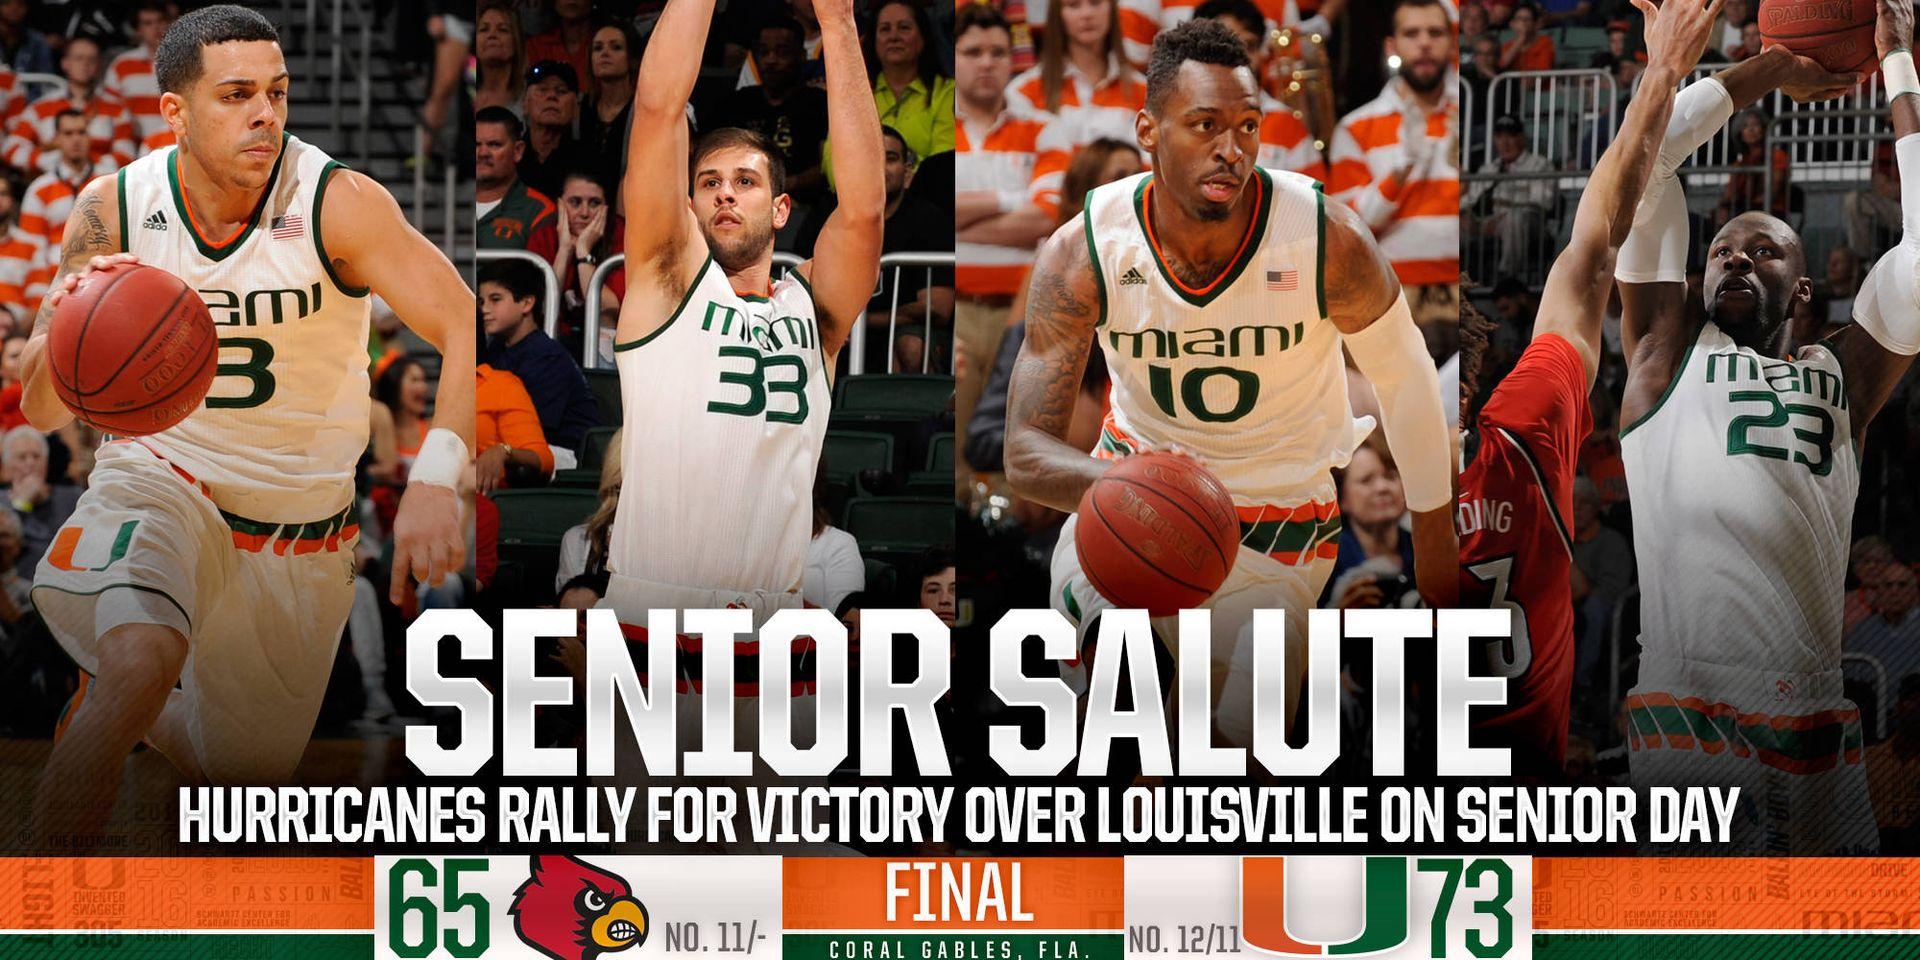 Senior Salute: @CanesHoops Tops Louisville, 73-65